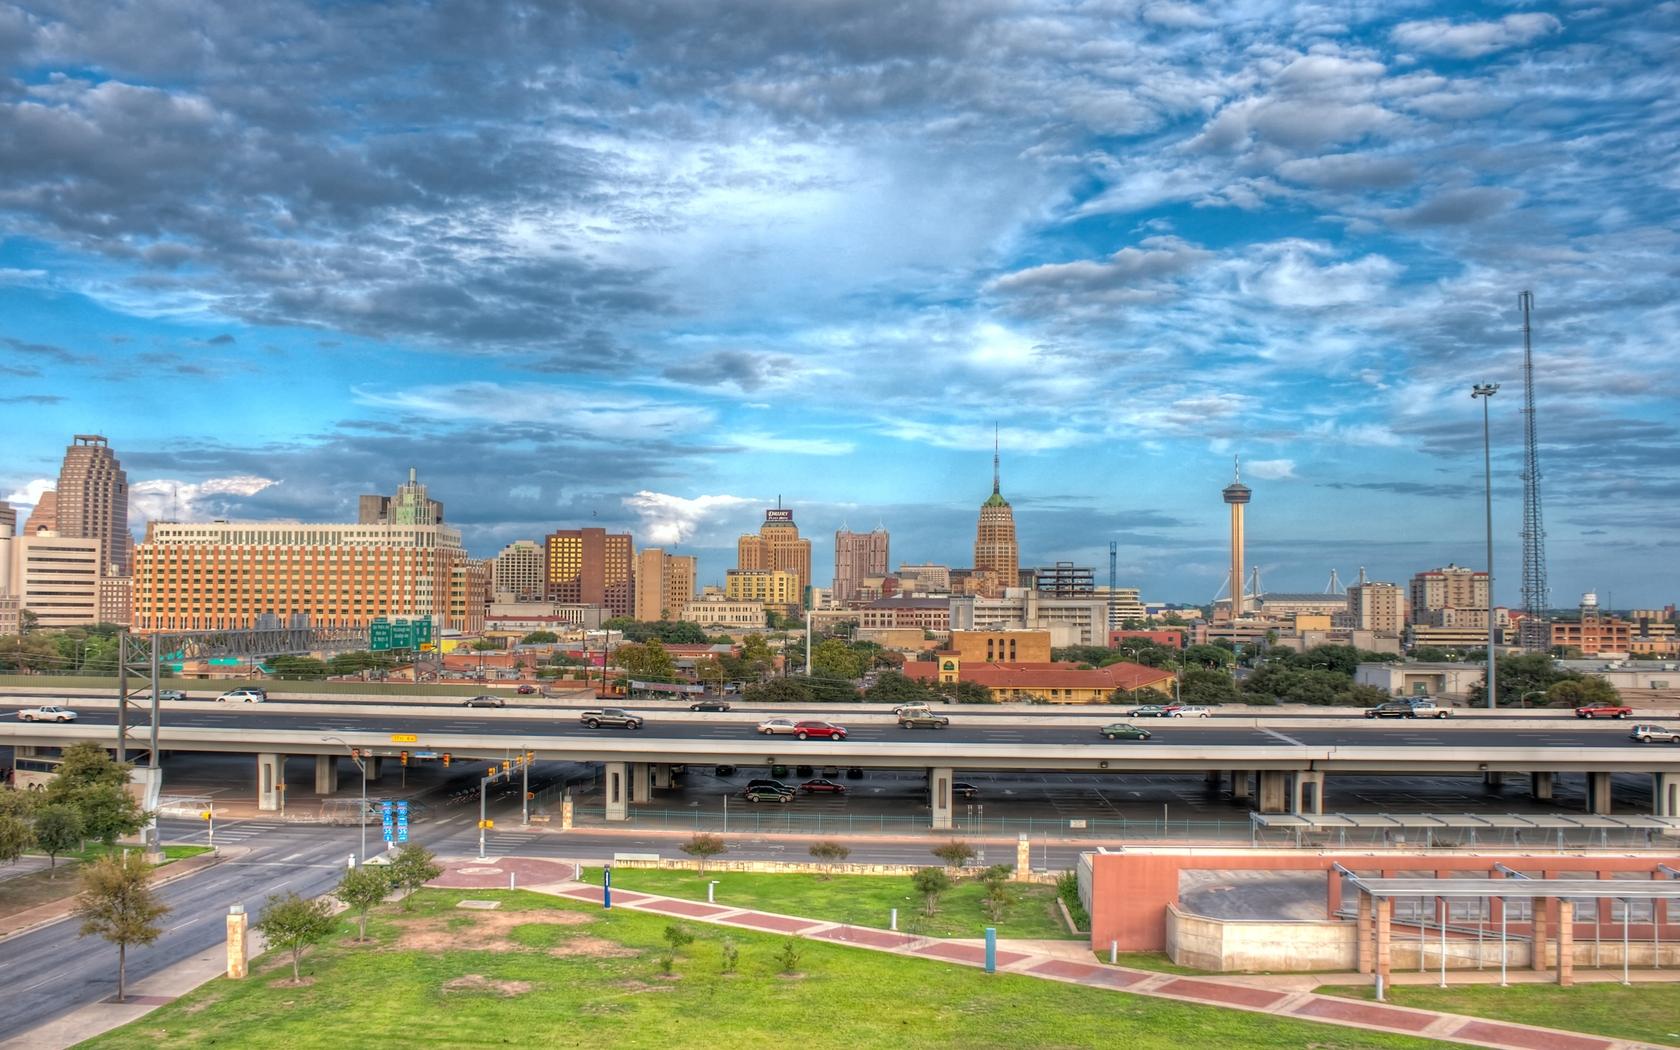 Wallpaper San Antonio Texas Road Bridge Building